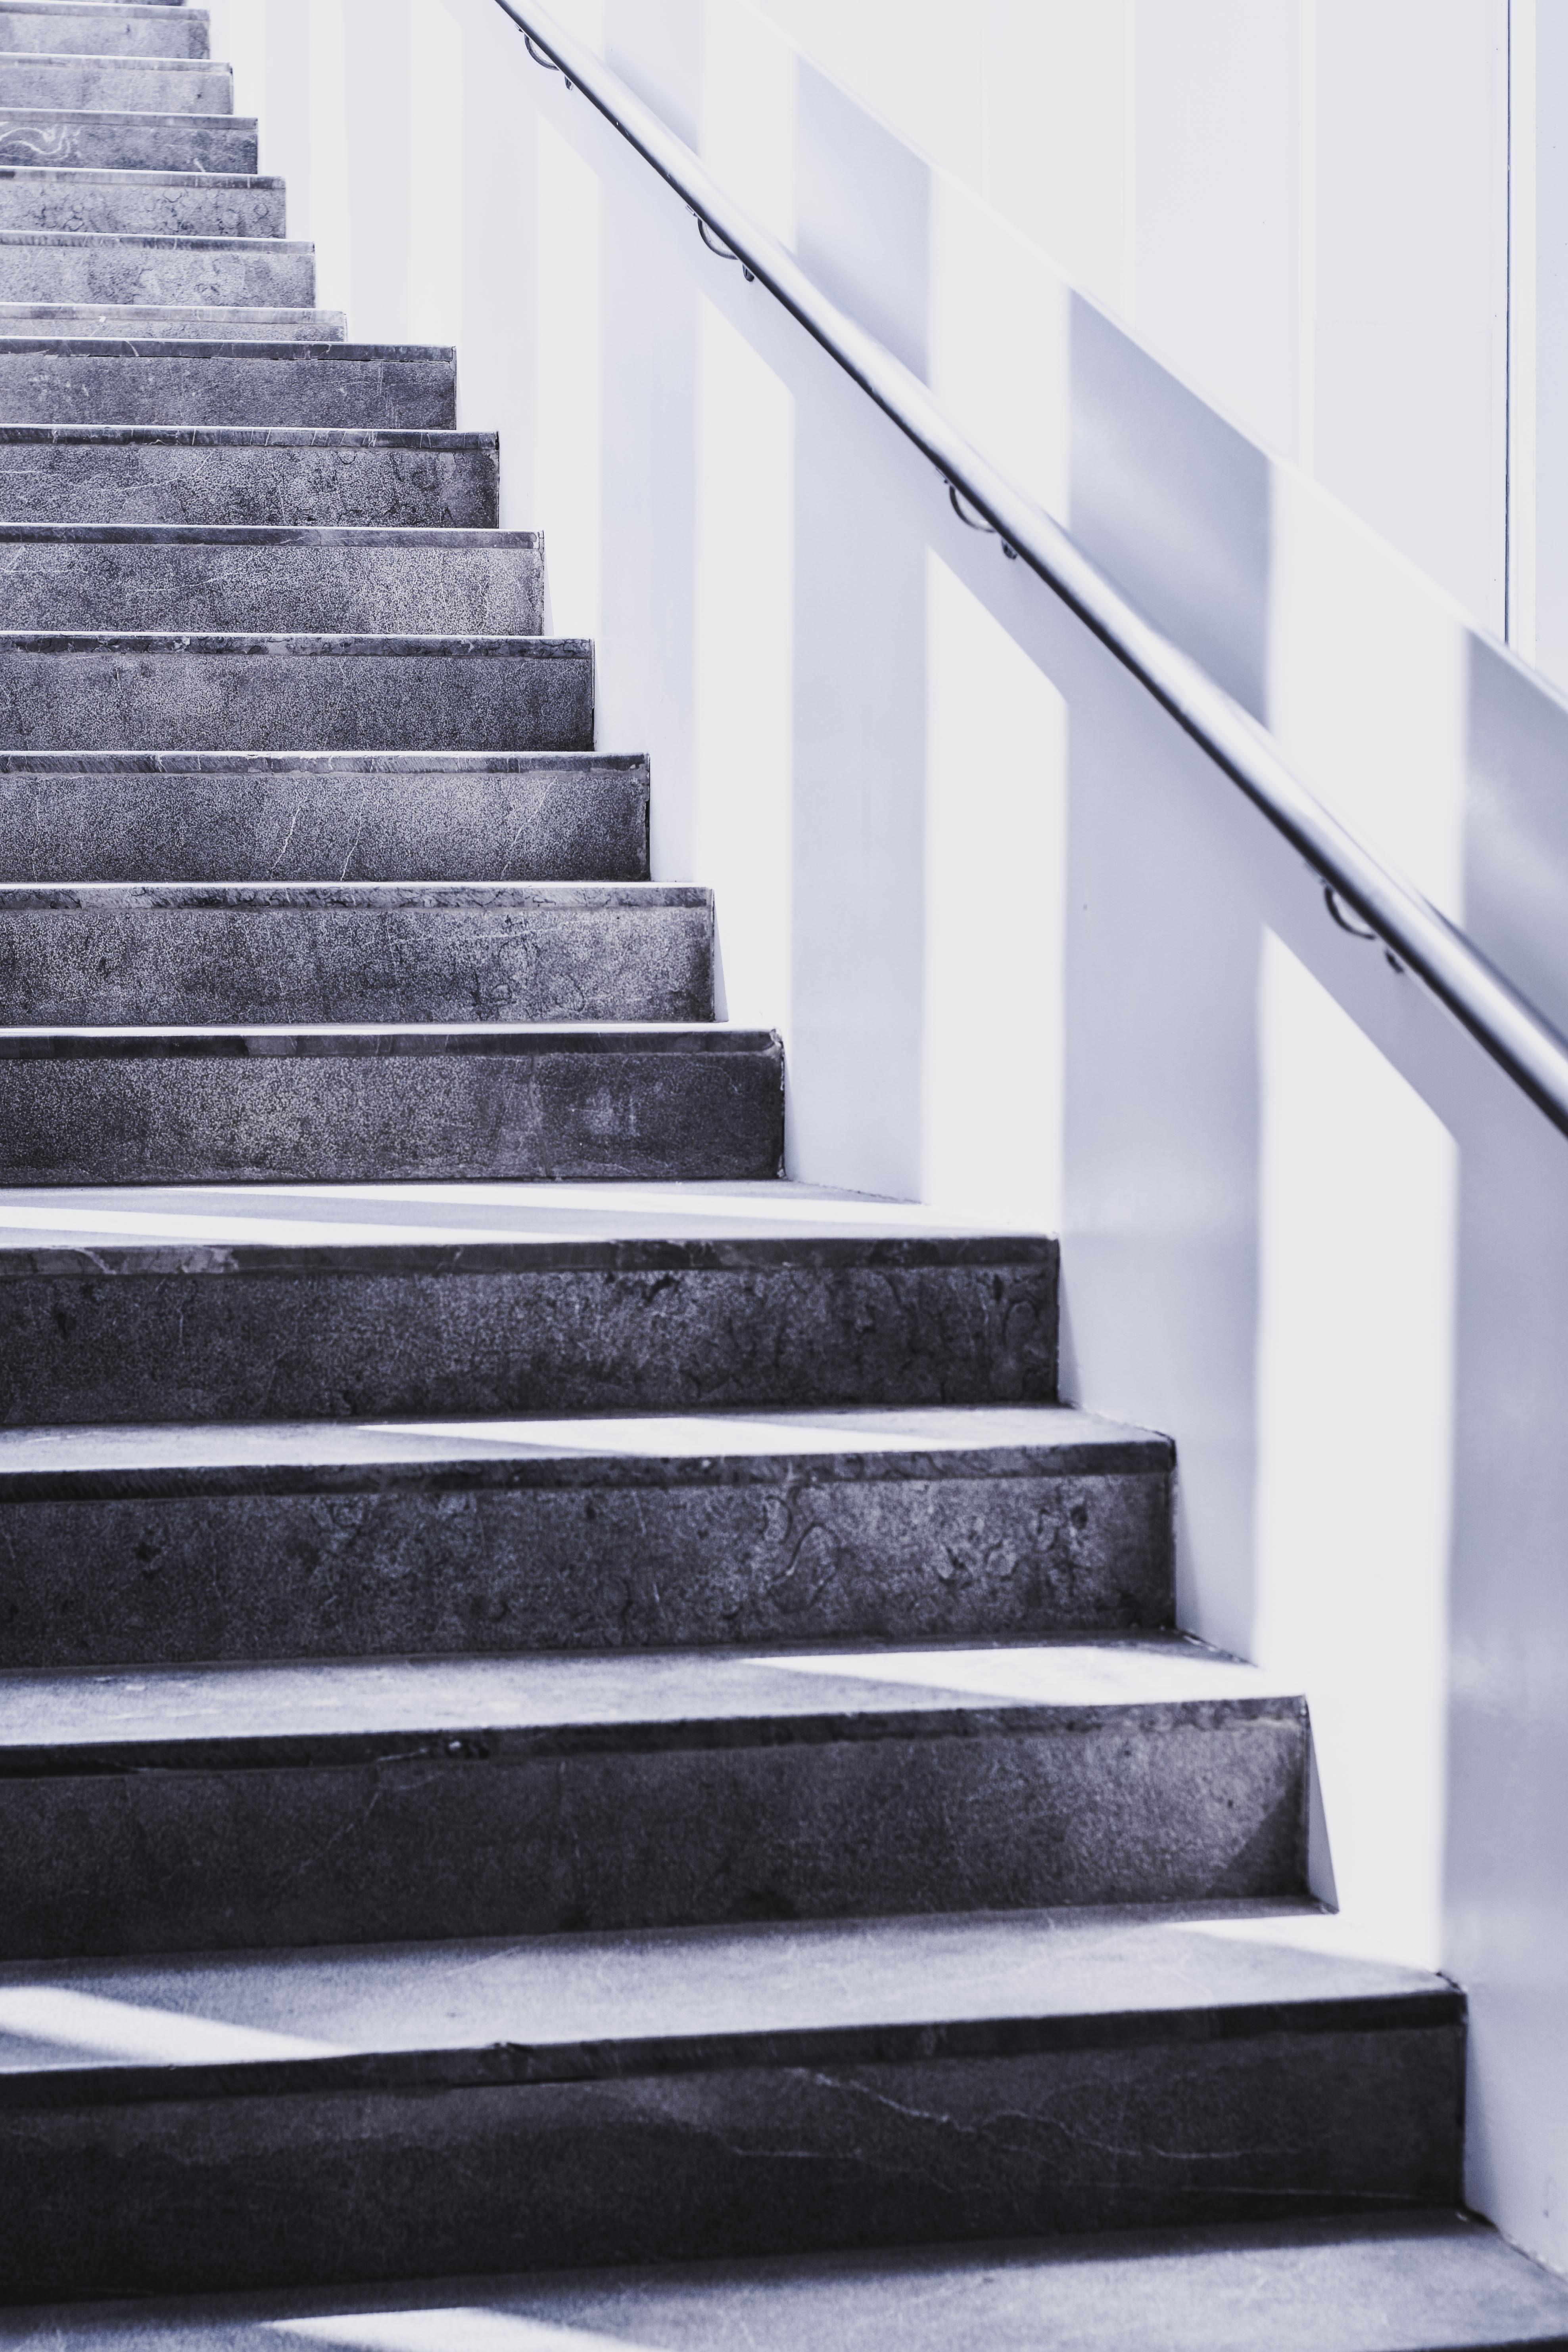 1000+ Amazing Stairs Photos · Pexels · Free Stock Photos